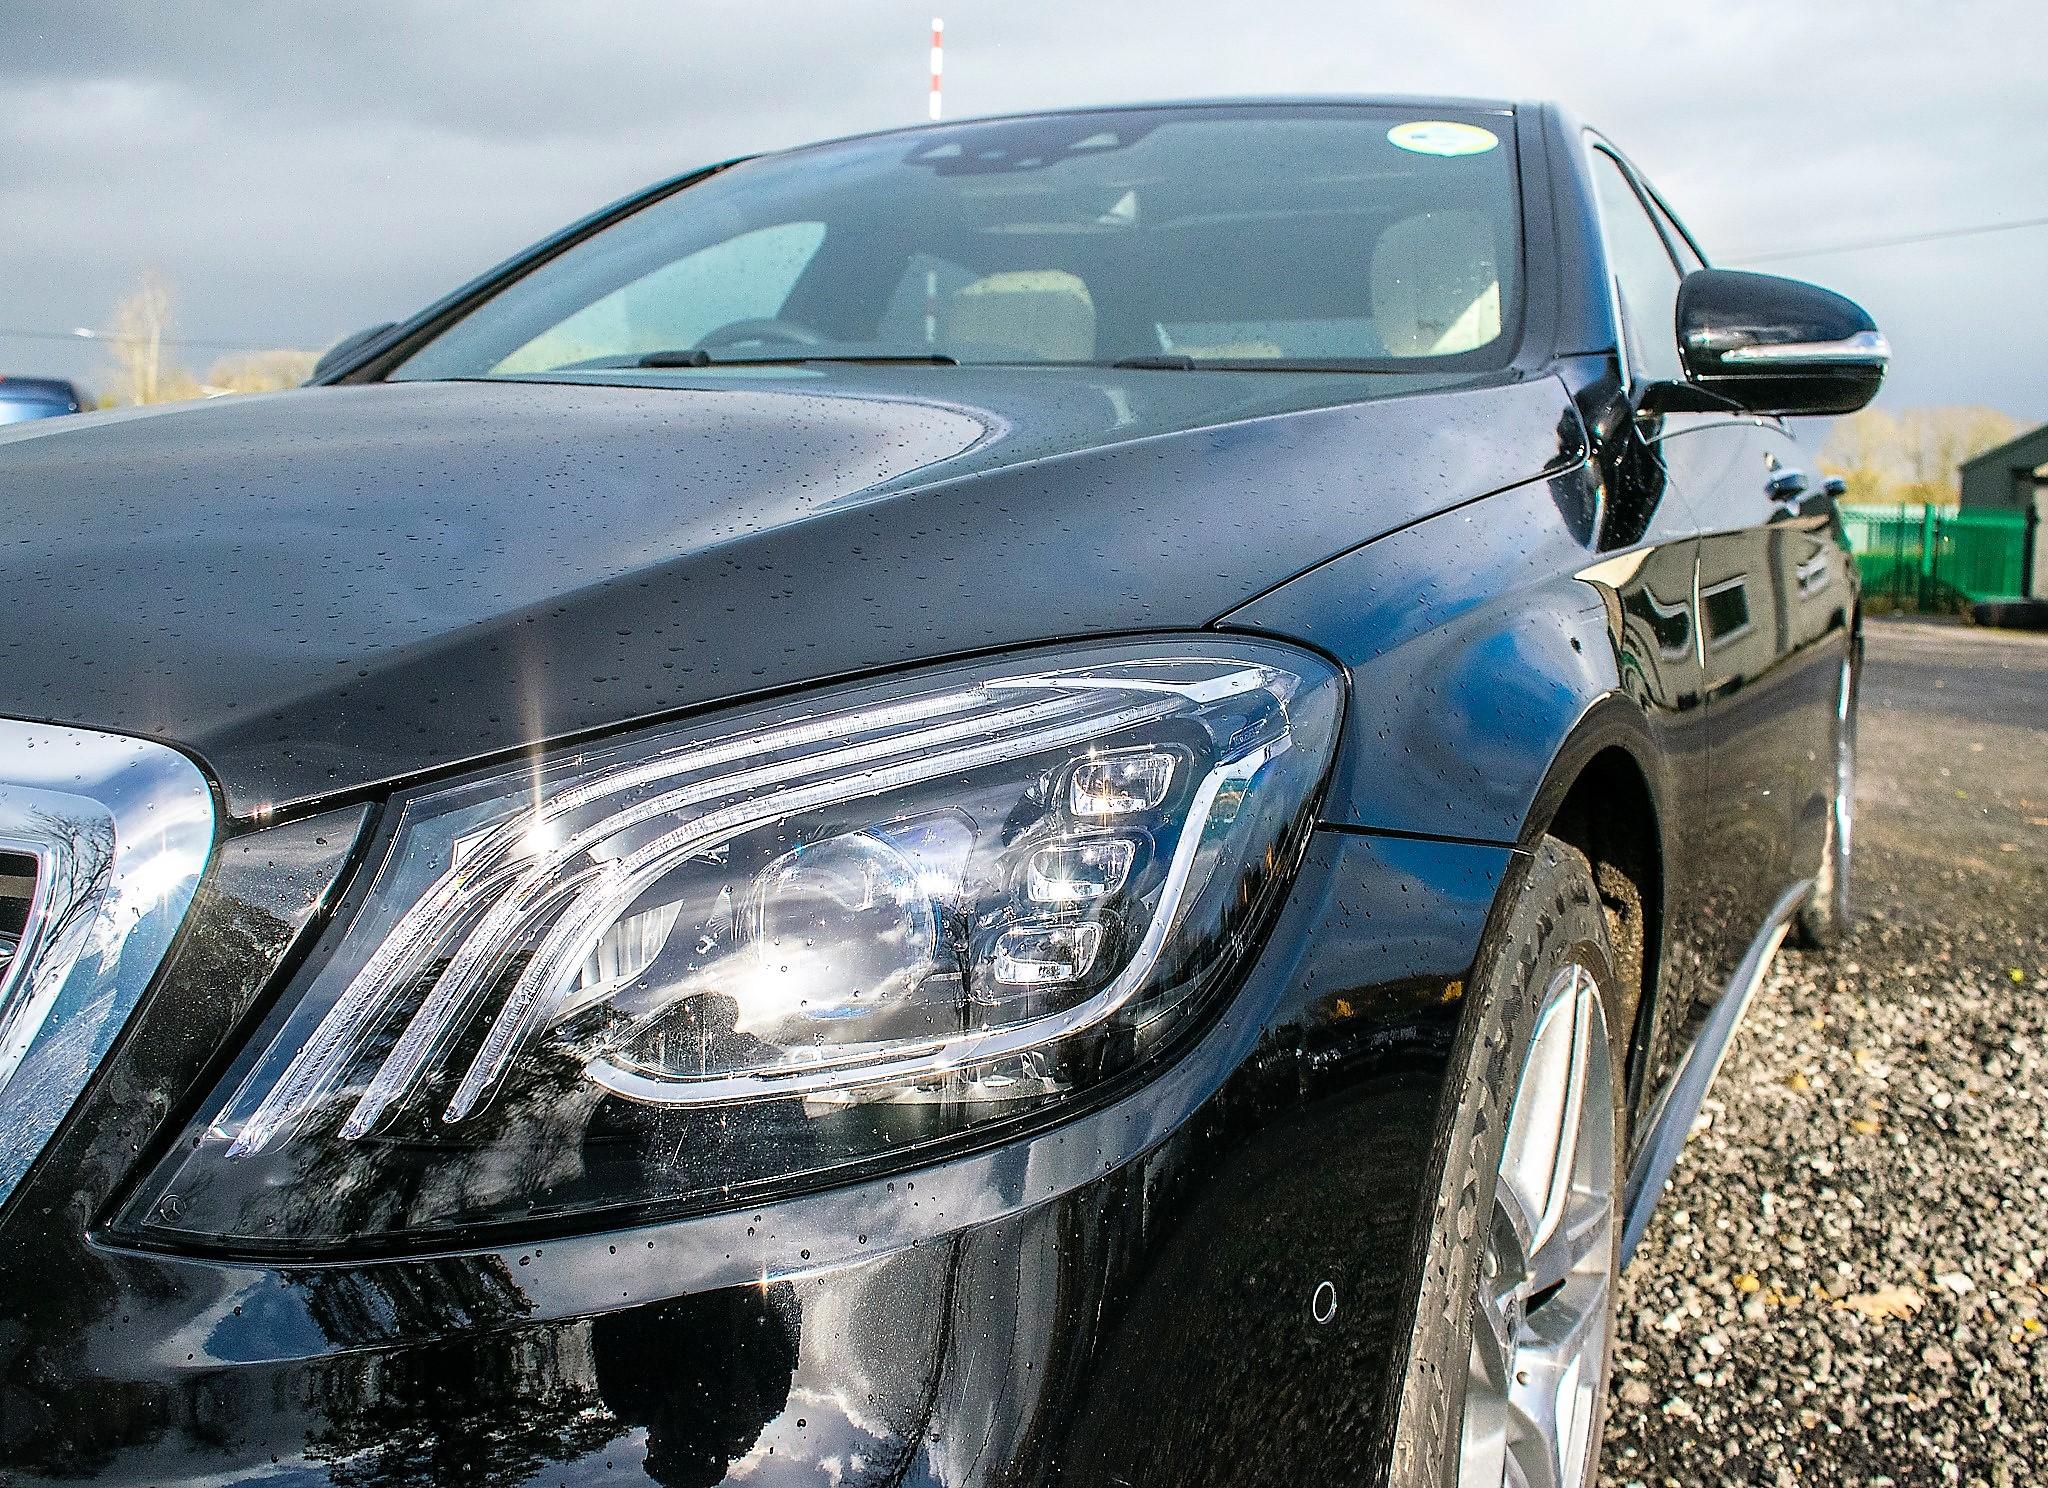 Mercedes Benz S450 L AMG Line Executive auto petrol 4 door saloon car Registration Number: FX68 - Image 12 of 30